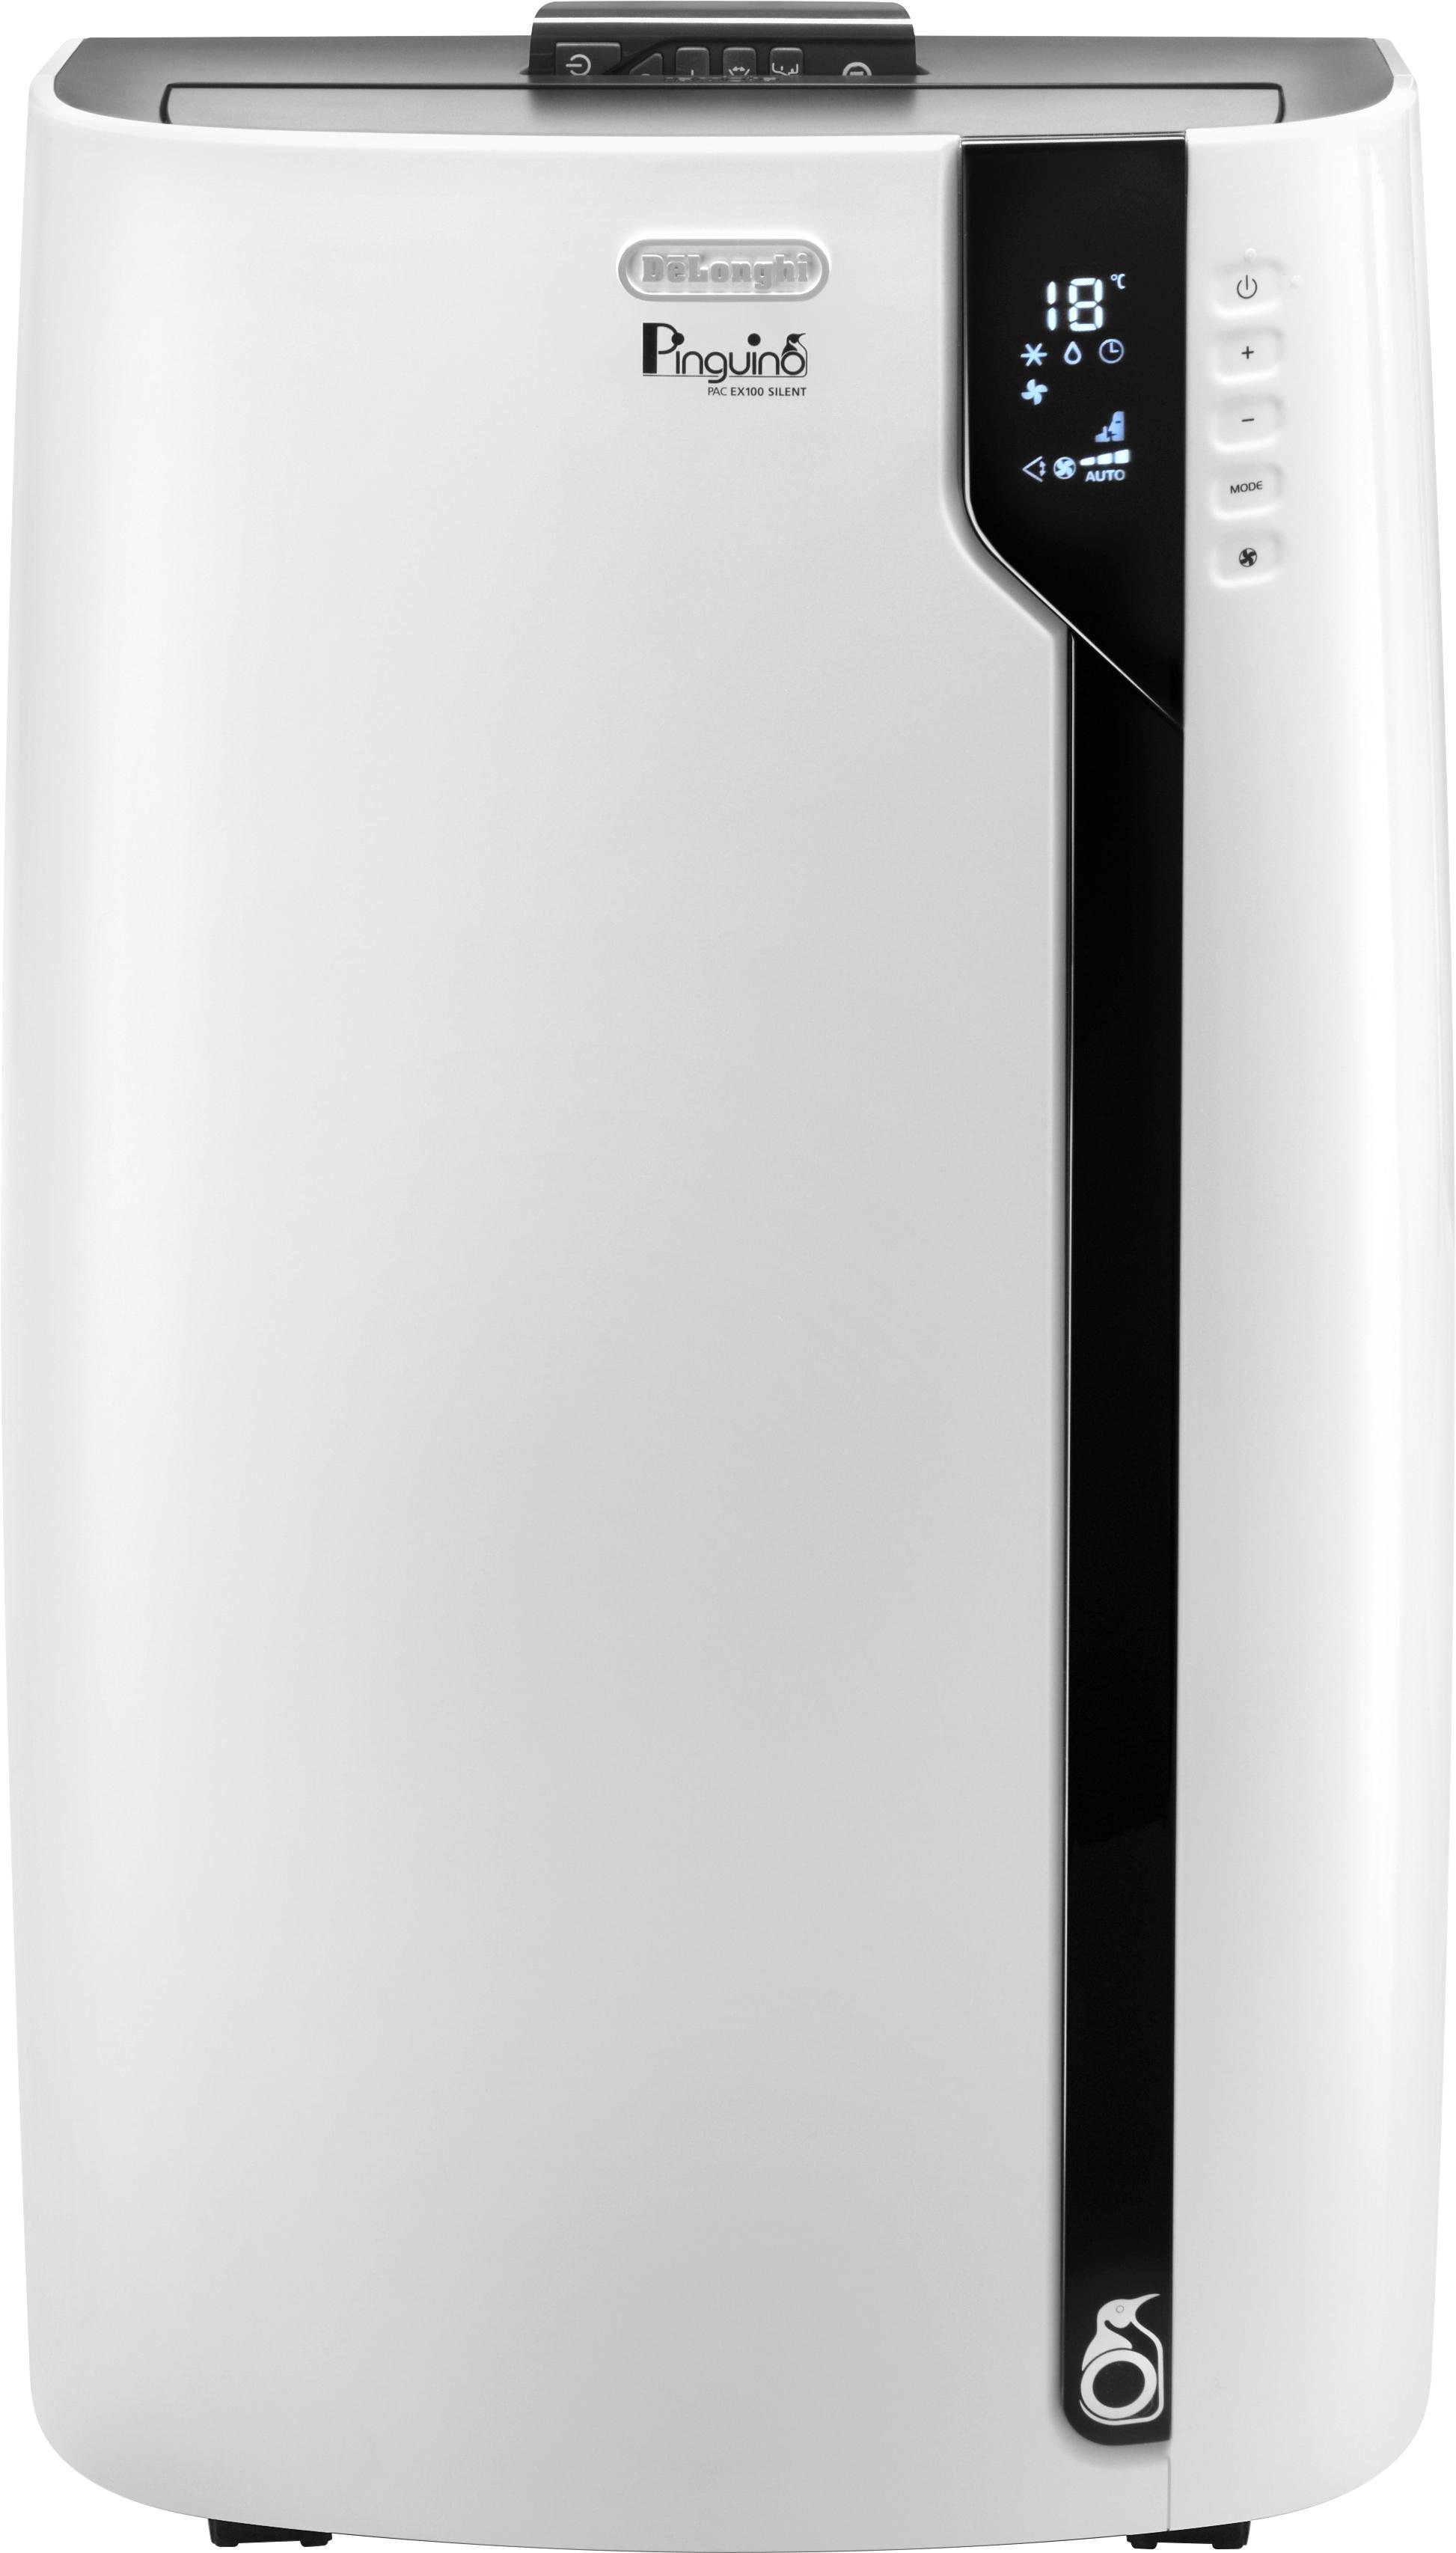 Delonghi Mobiele airco PAC EX100 Silent A++ online kopen op otto.nl